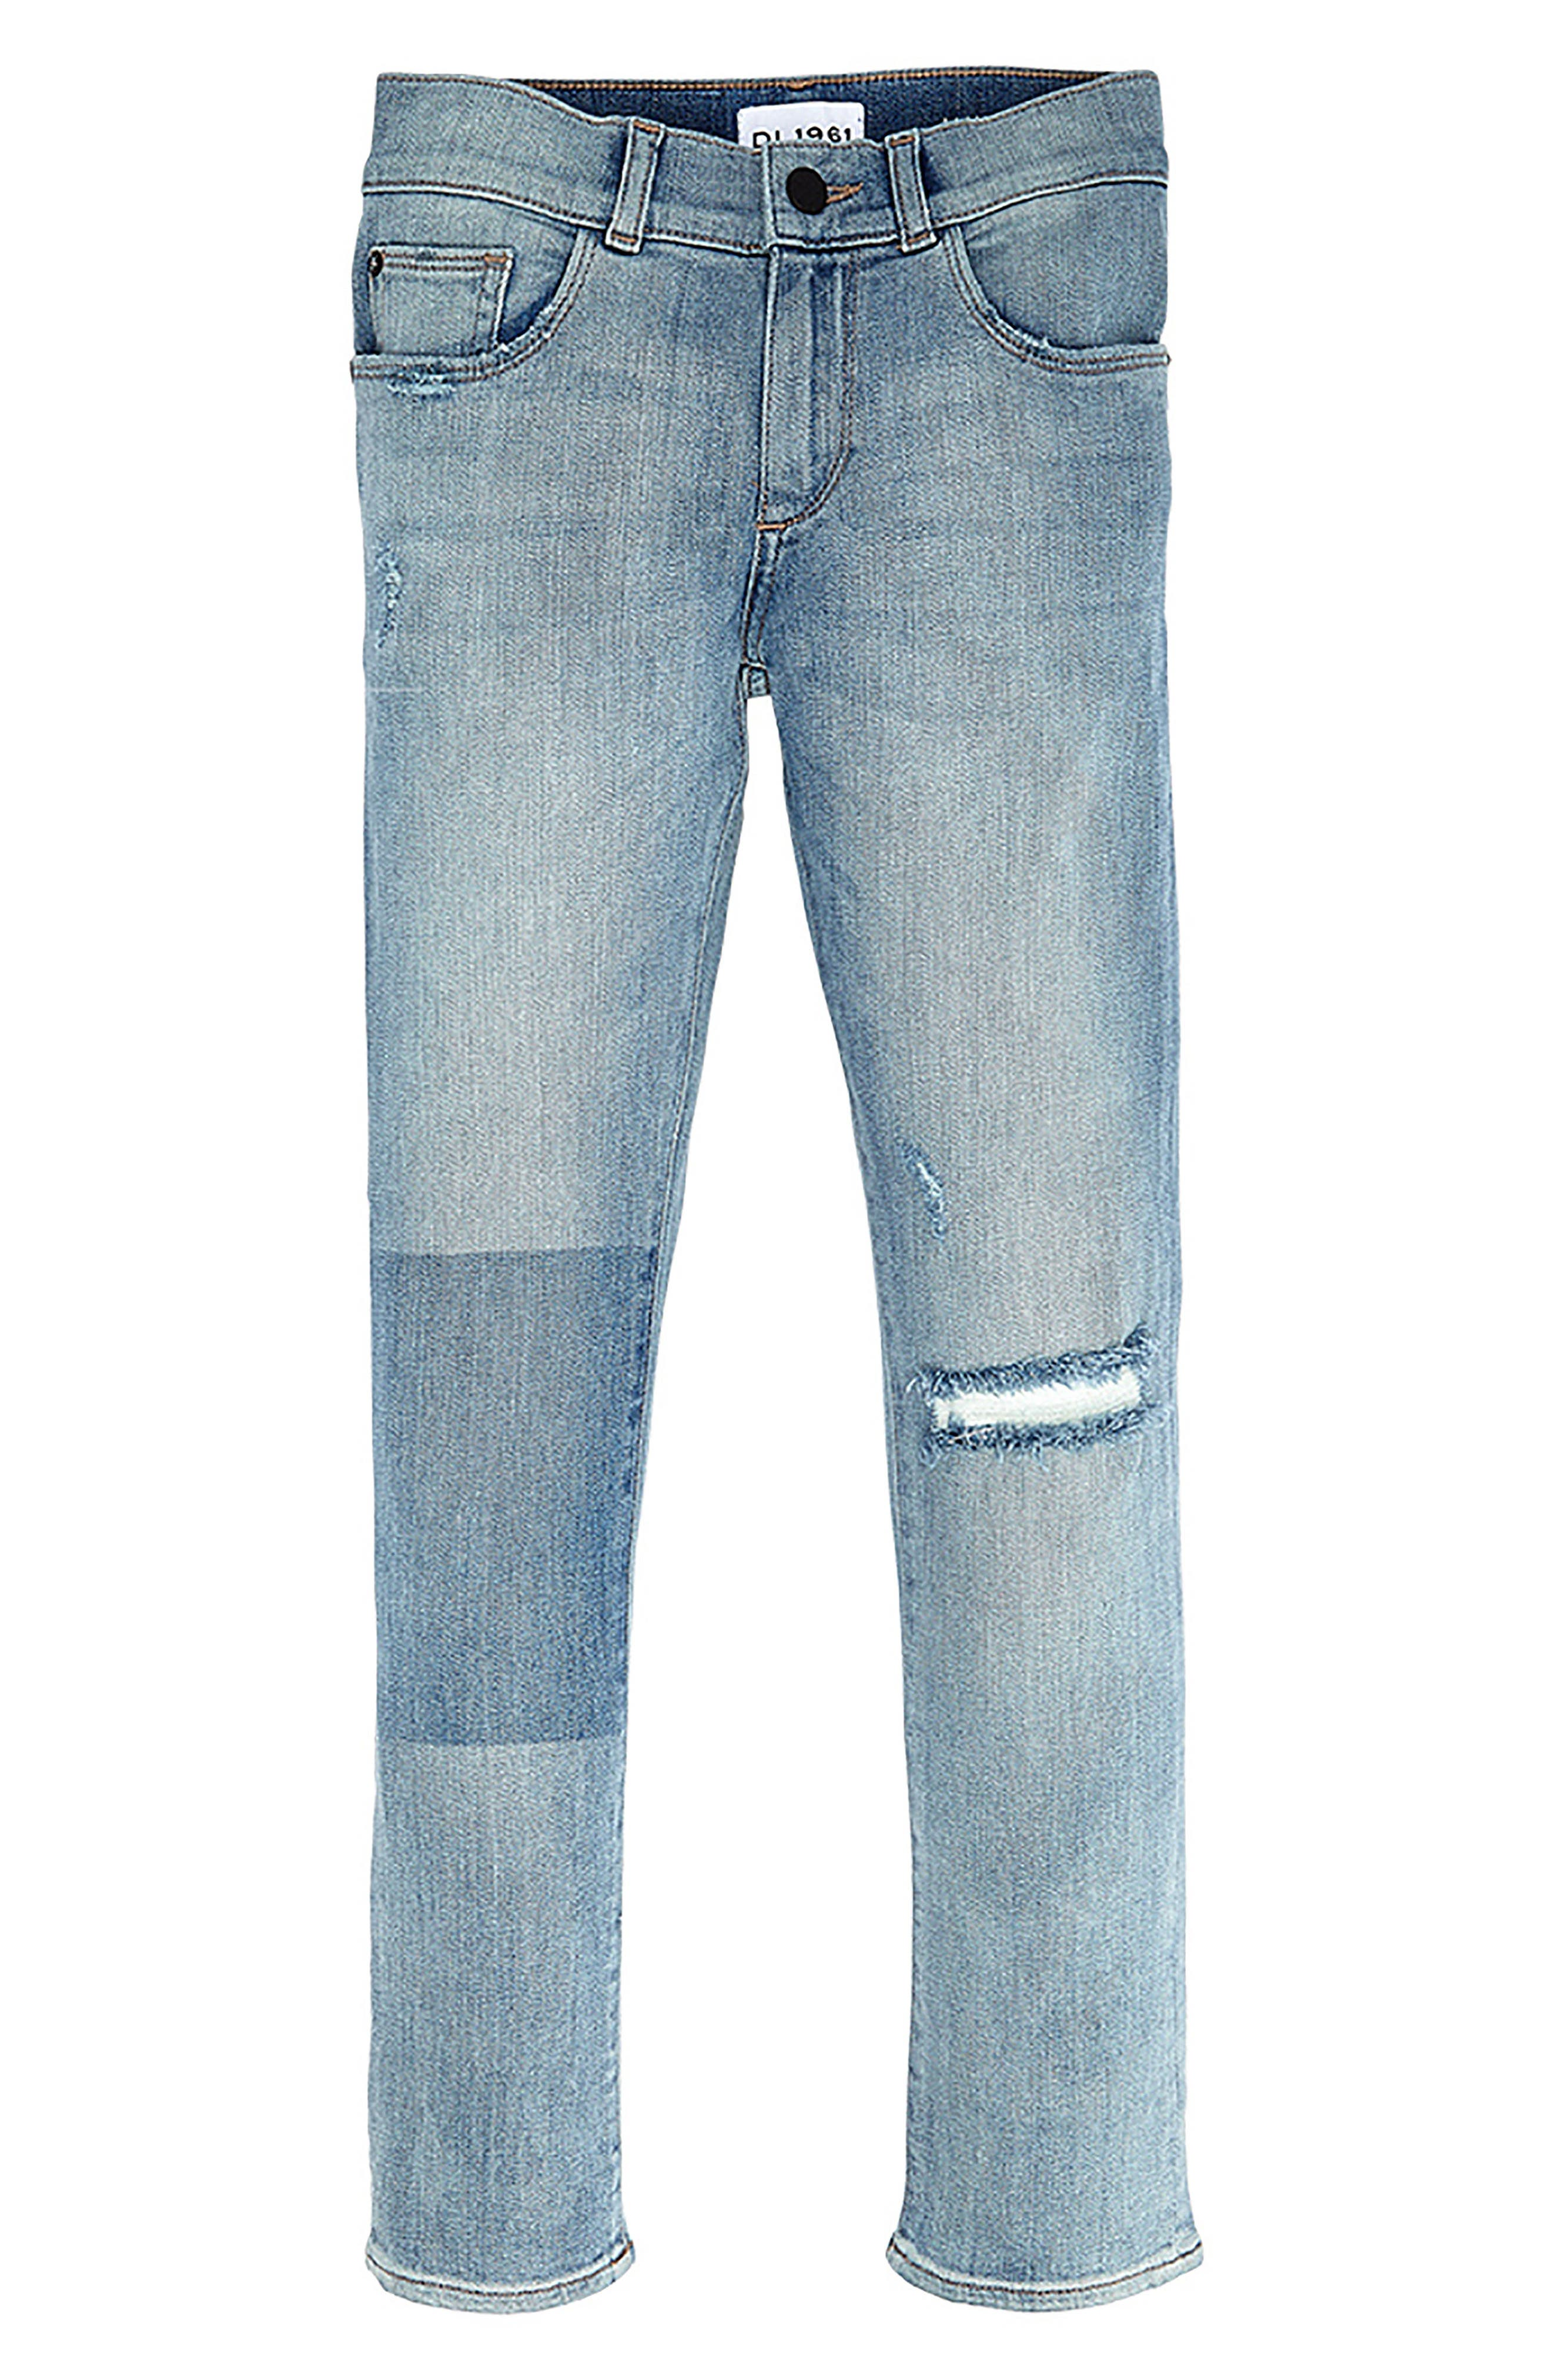 DL 1961 Hawke Skinny Jeans,                             Main thumbnail 1, color,                             BRAIN FREEZE